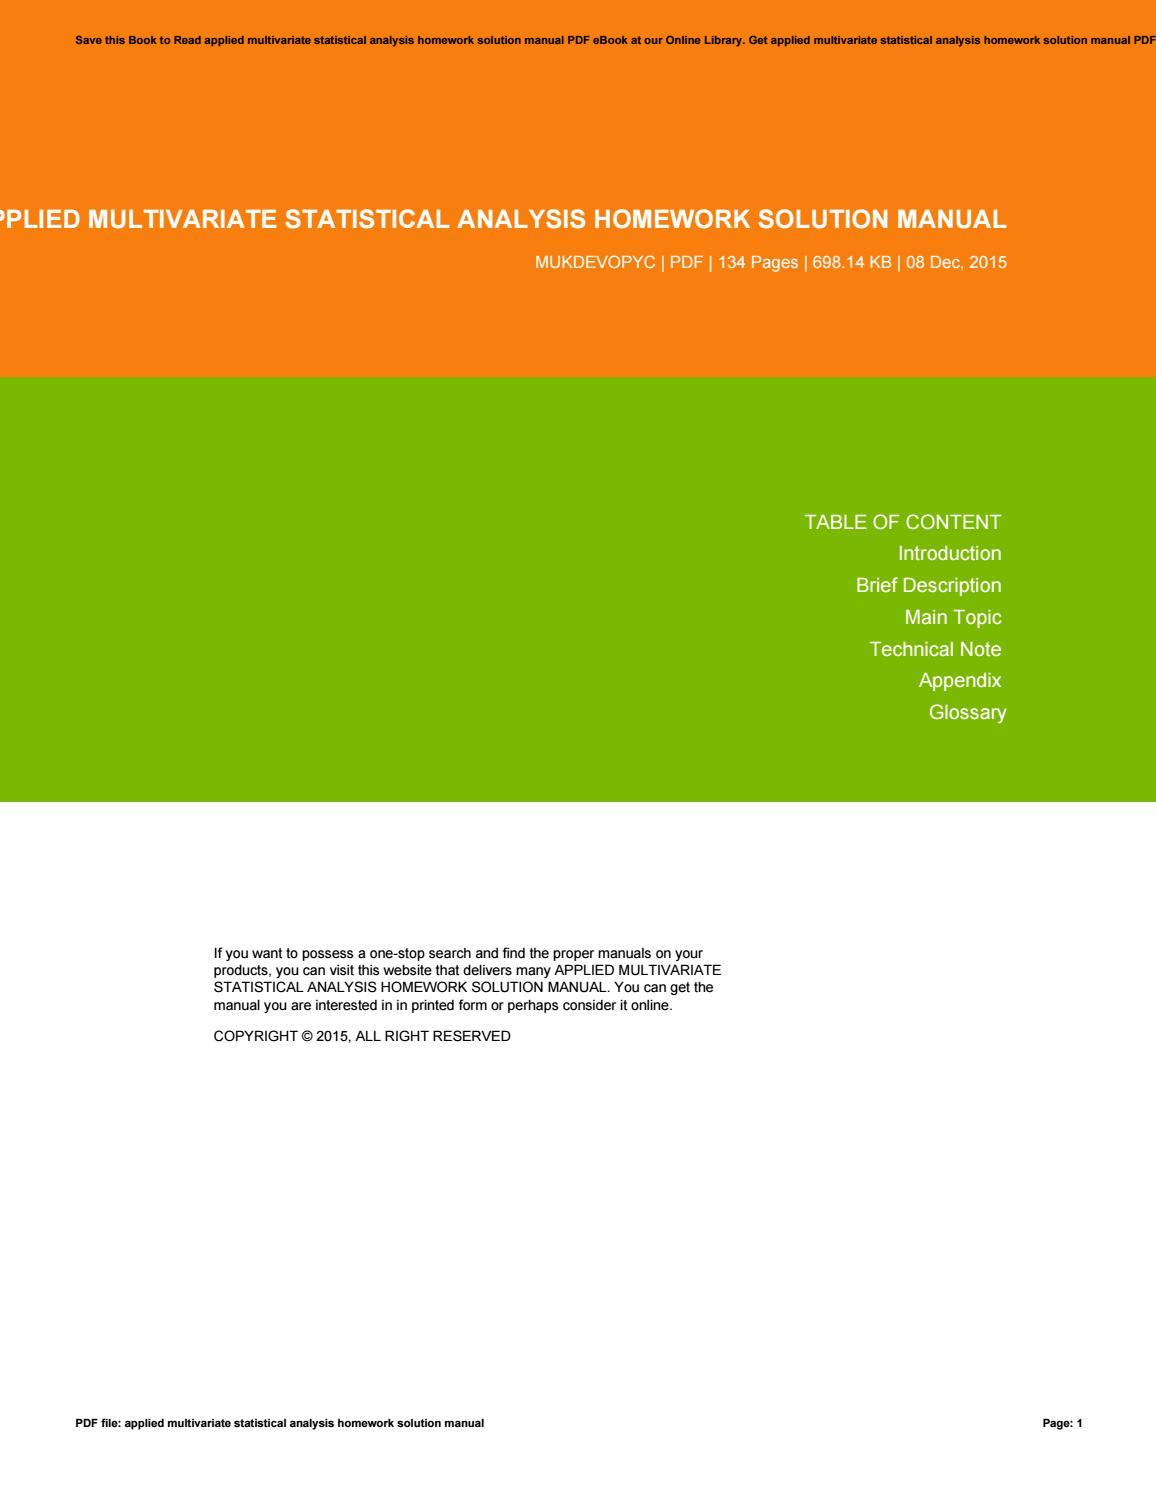 Applied multivariate statistical analysis homework solution manual by  isdaq42 - issuu